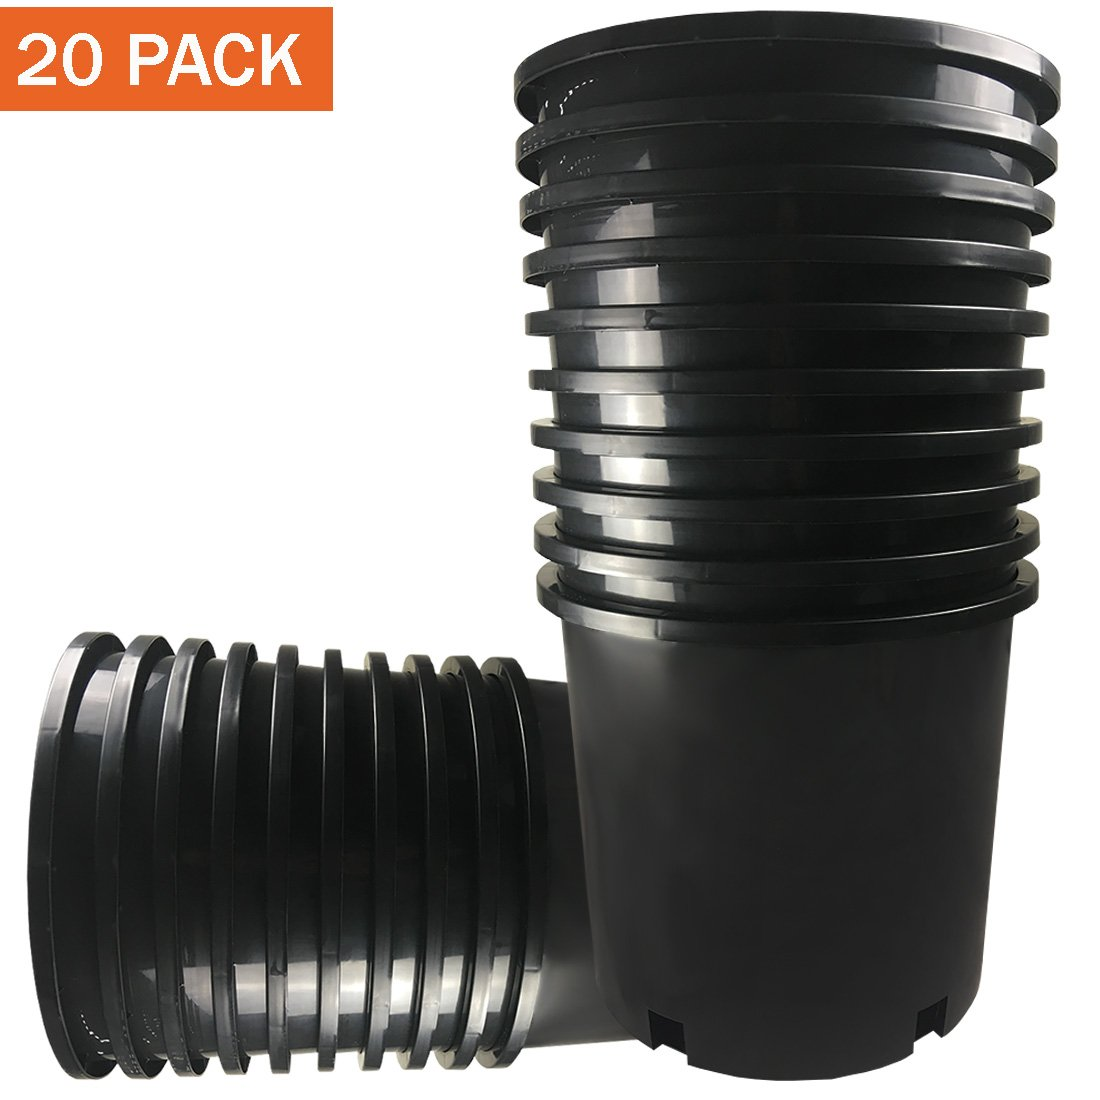 CaliPots 20-Pack 5 Gallon Premium Black Plastic Nursery Plant Container Garden Planter Pots (5 Gallon)